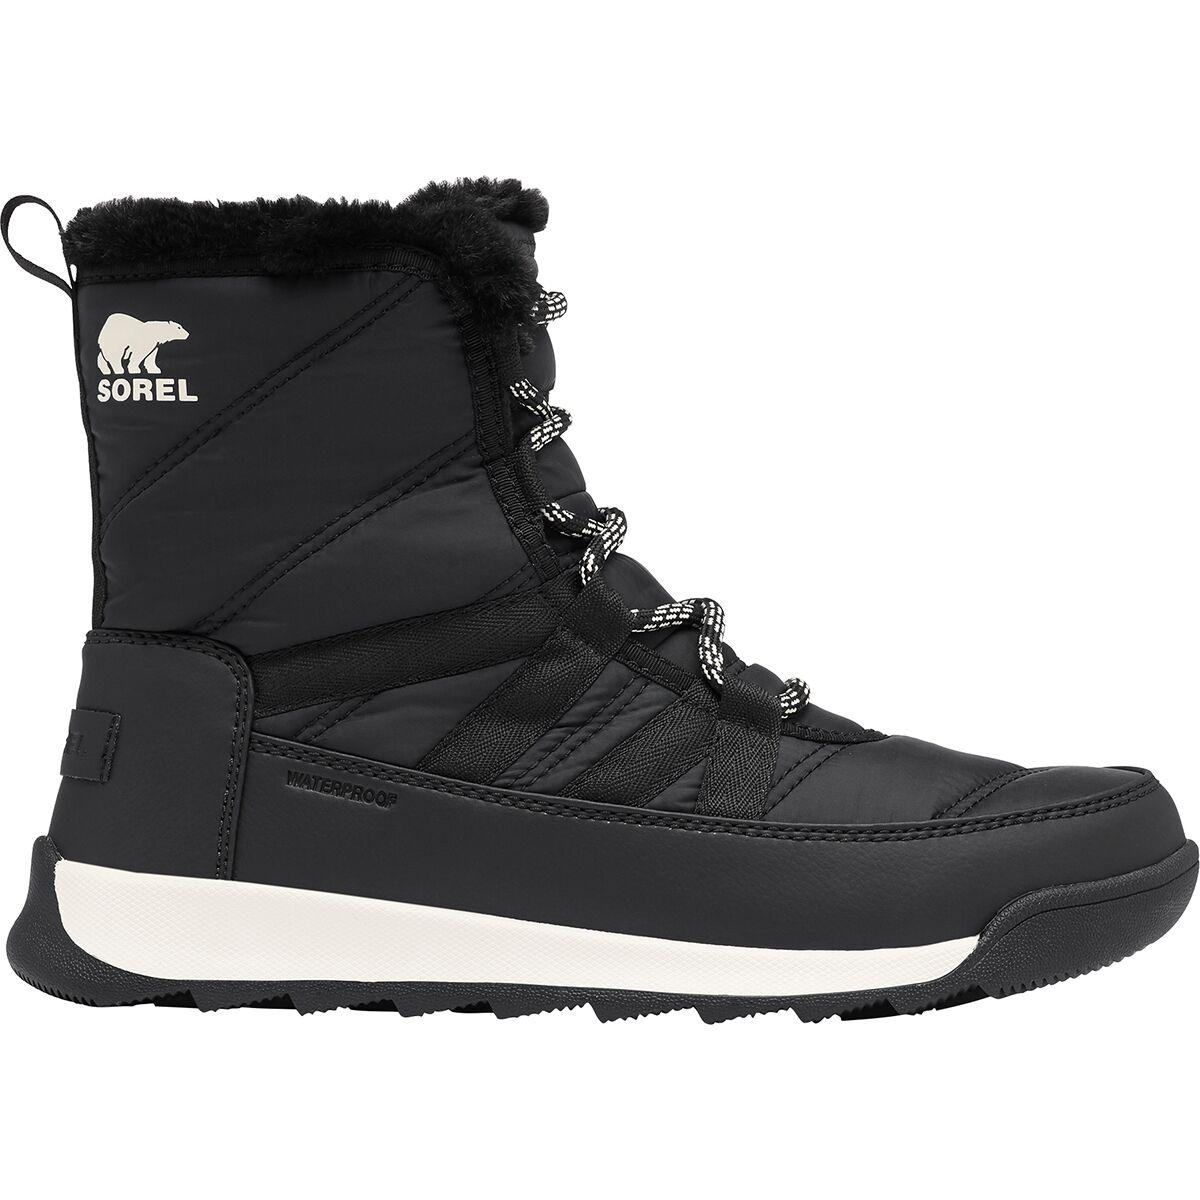 sorel whitney snow bootie